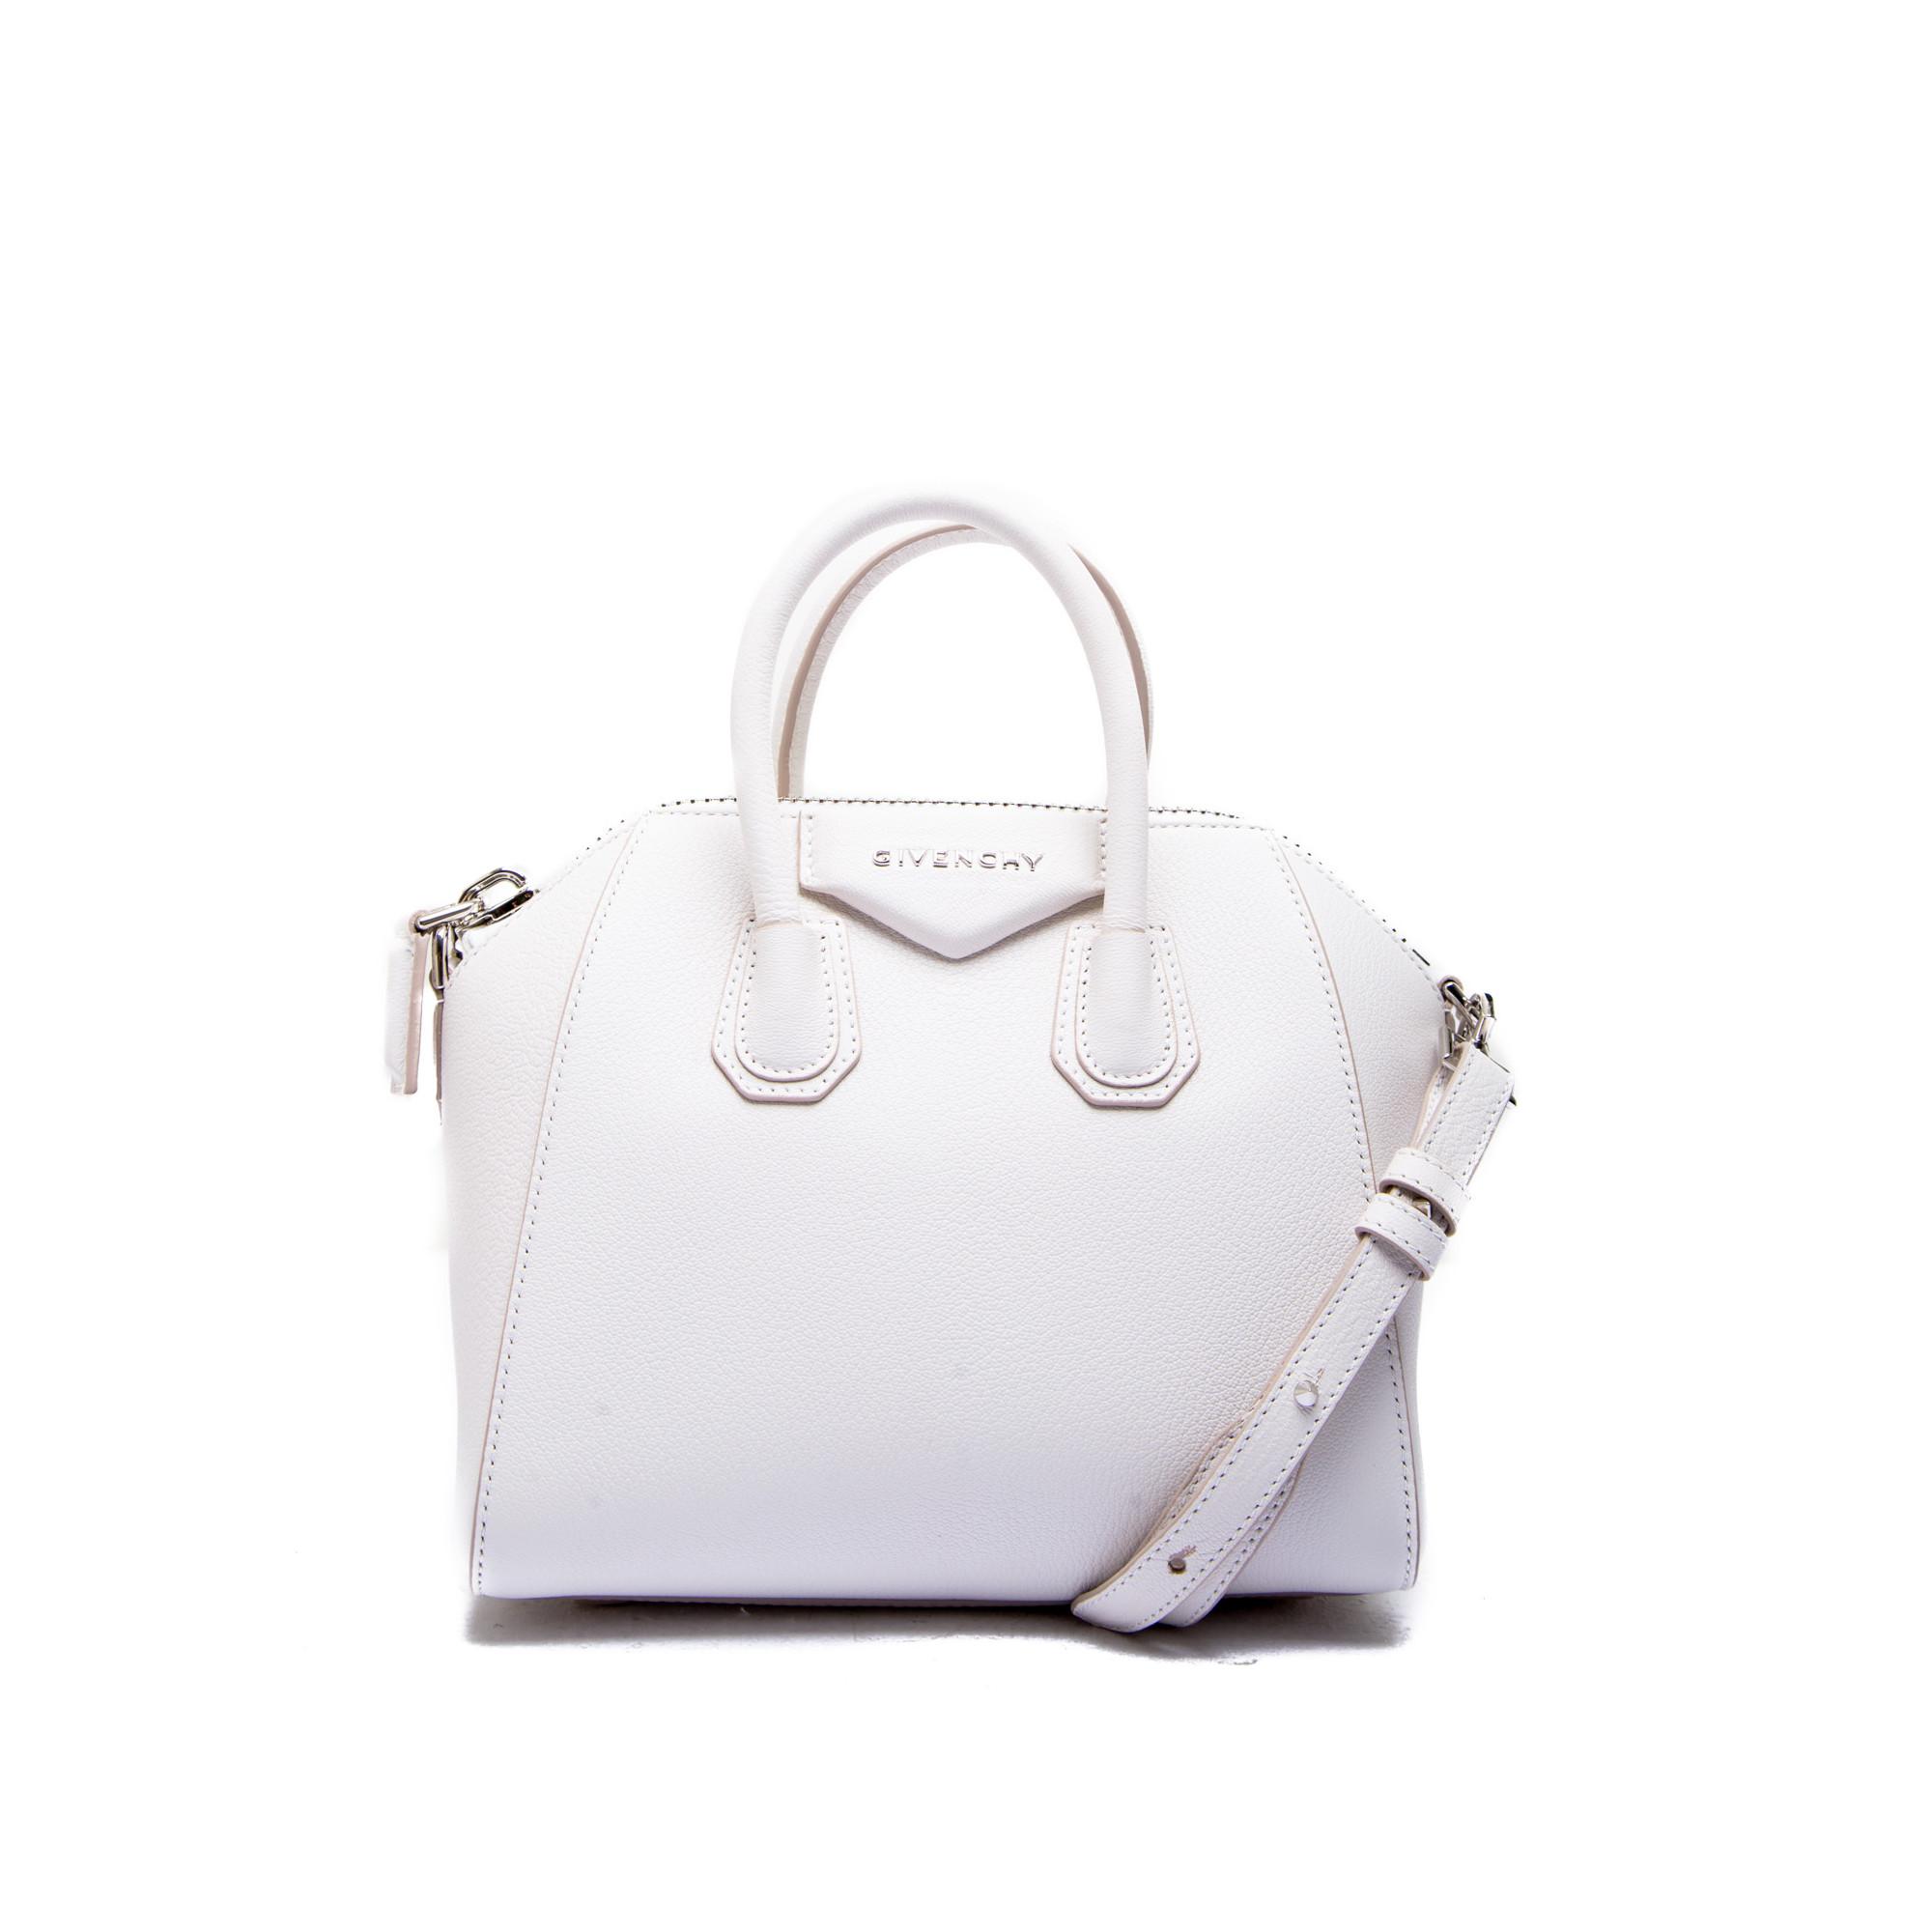 Givenchy antigona bag whitebb05114012 100 ss19 676fddb5cc